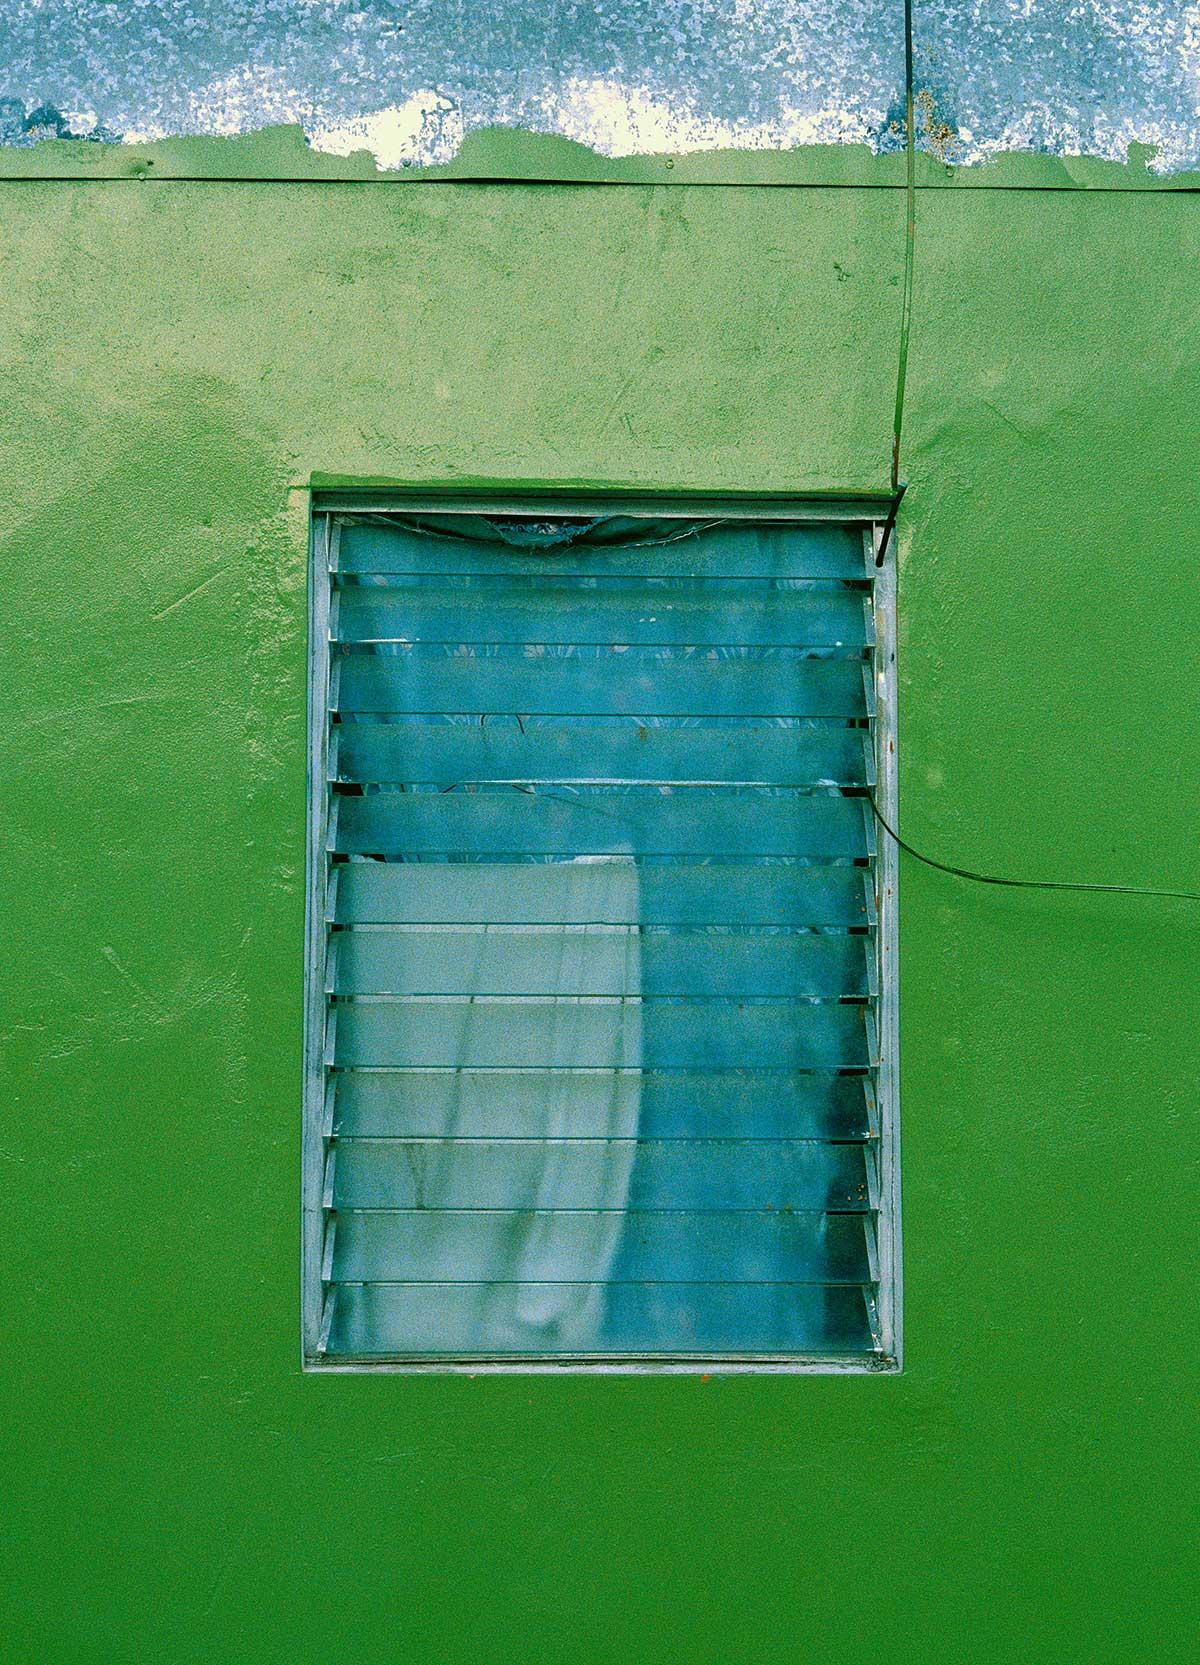 Cahuita – Suse Güllert